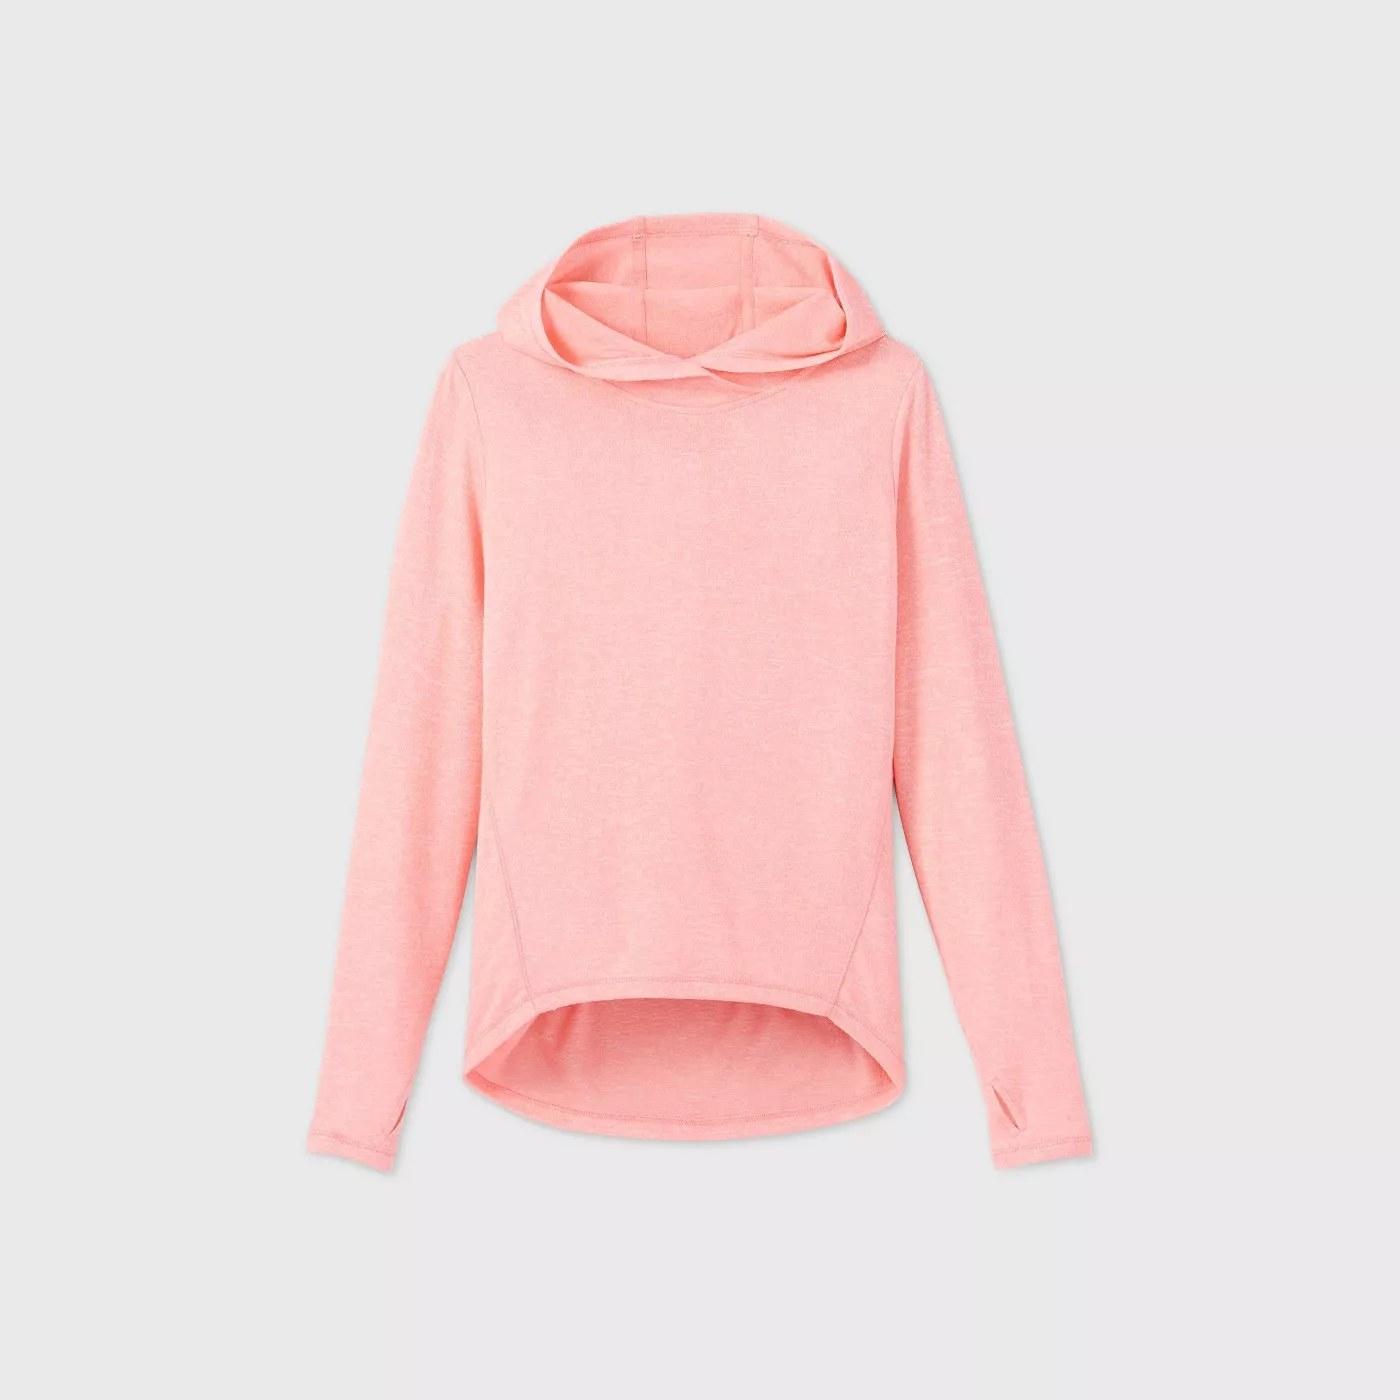 A pink, hooded sweatshirt